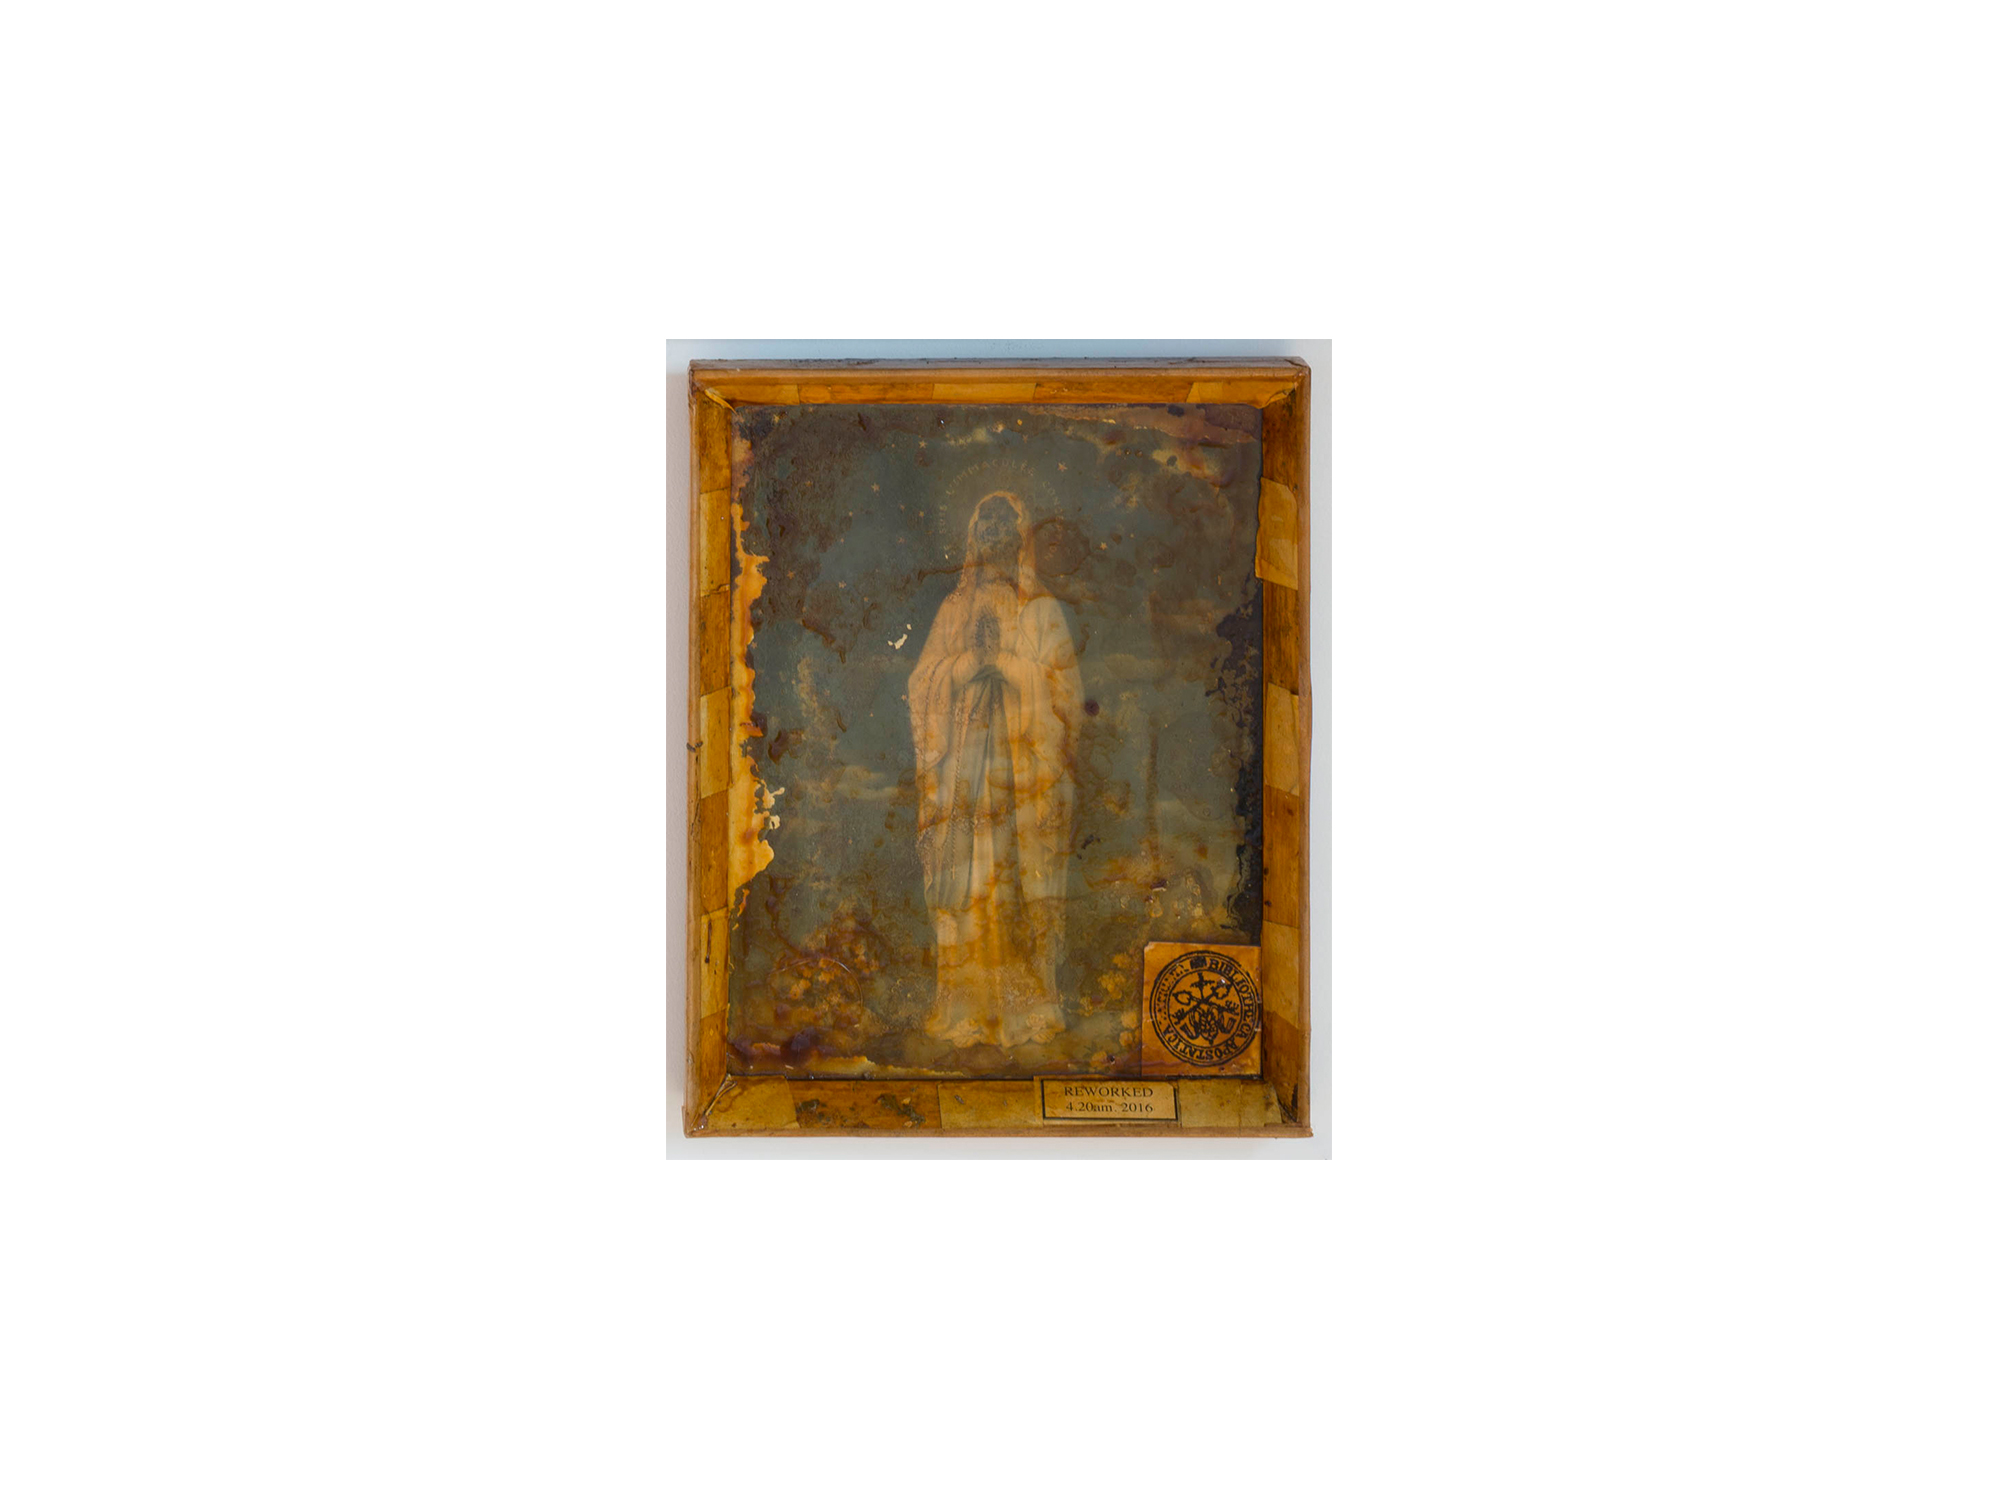 Bernard Sachs   Untitled (Weltsinneslust) , 2016 mixed media on framed photo paper 28 x 23cm   ARTIST BIO